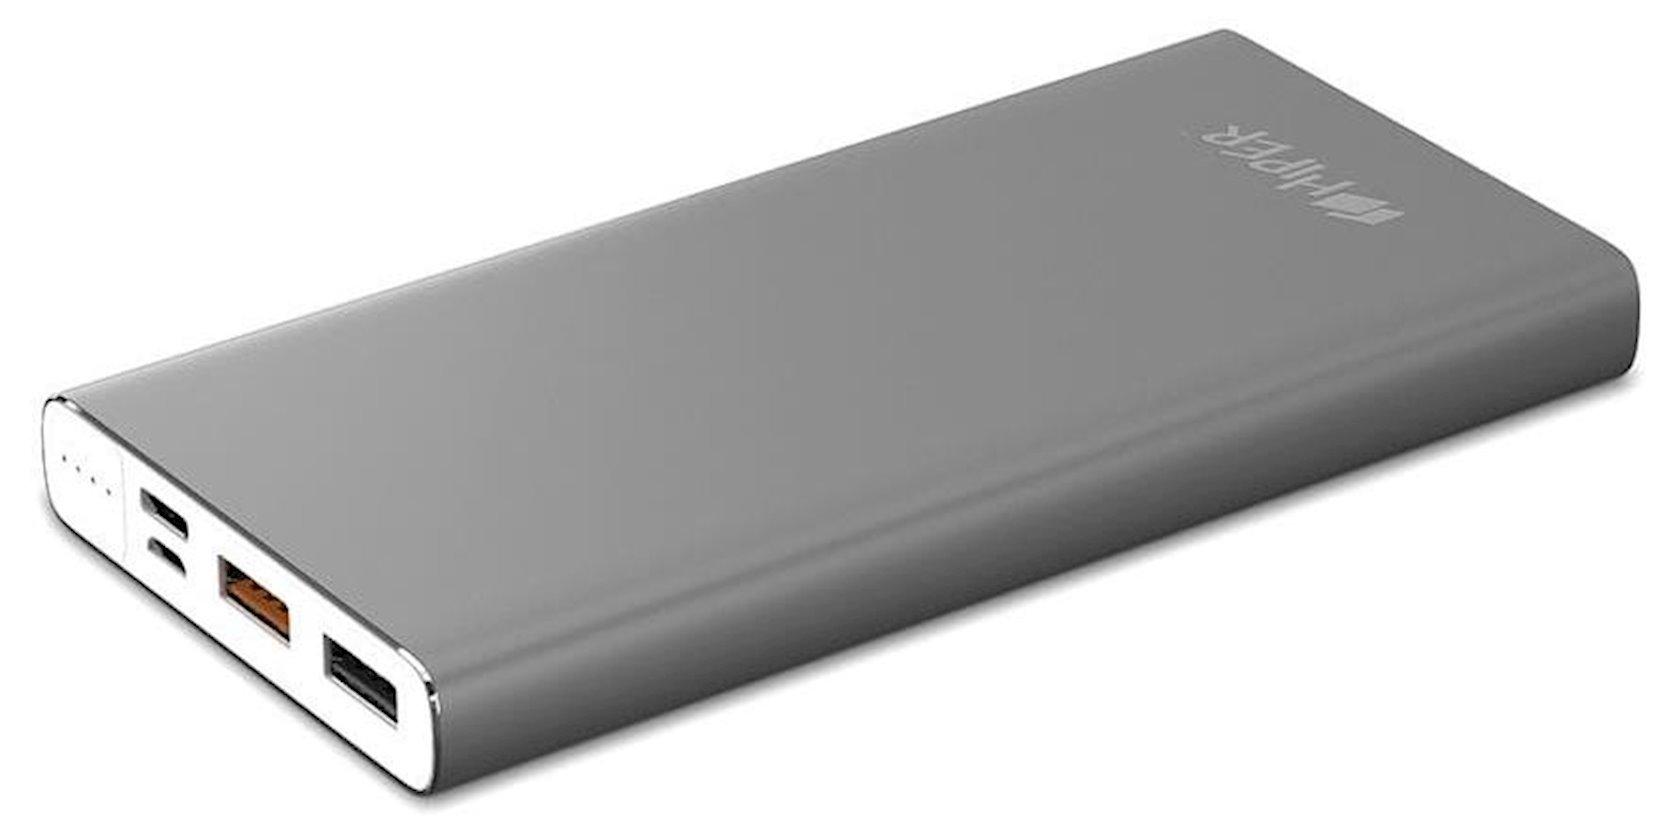 Xarici akkumulyator Hiper Power Bank 10000 mA/saat MPX10000 Space Gray